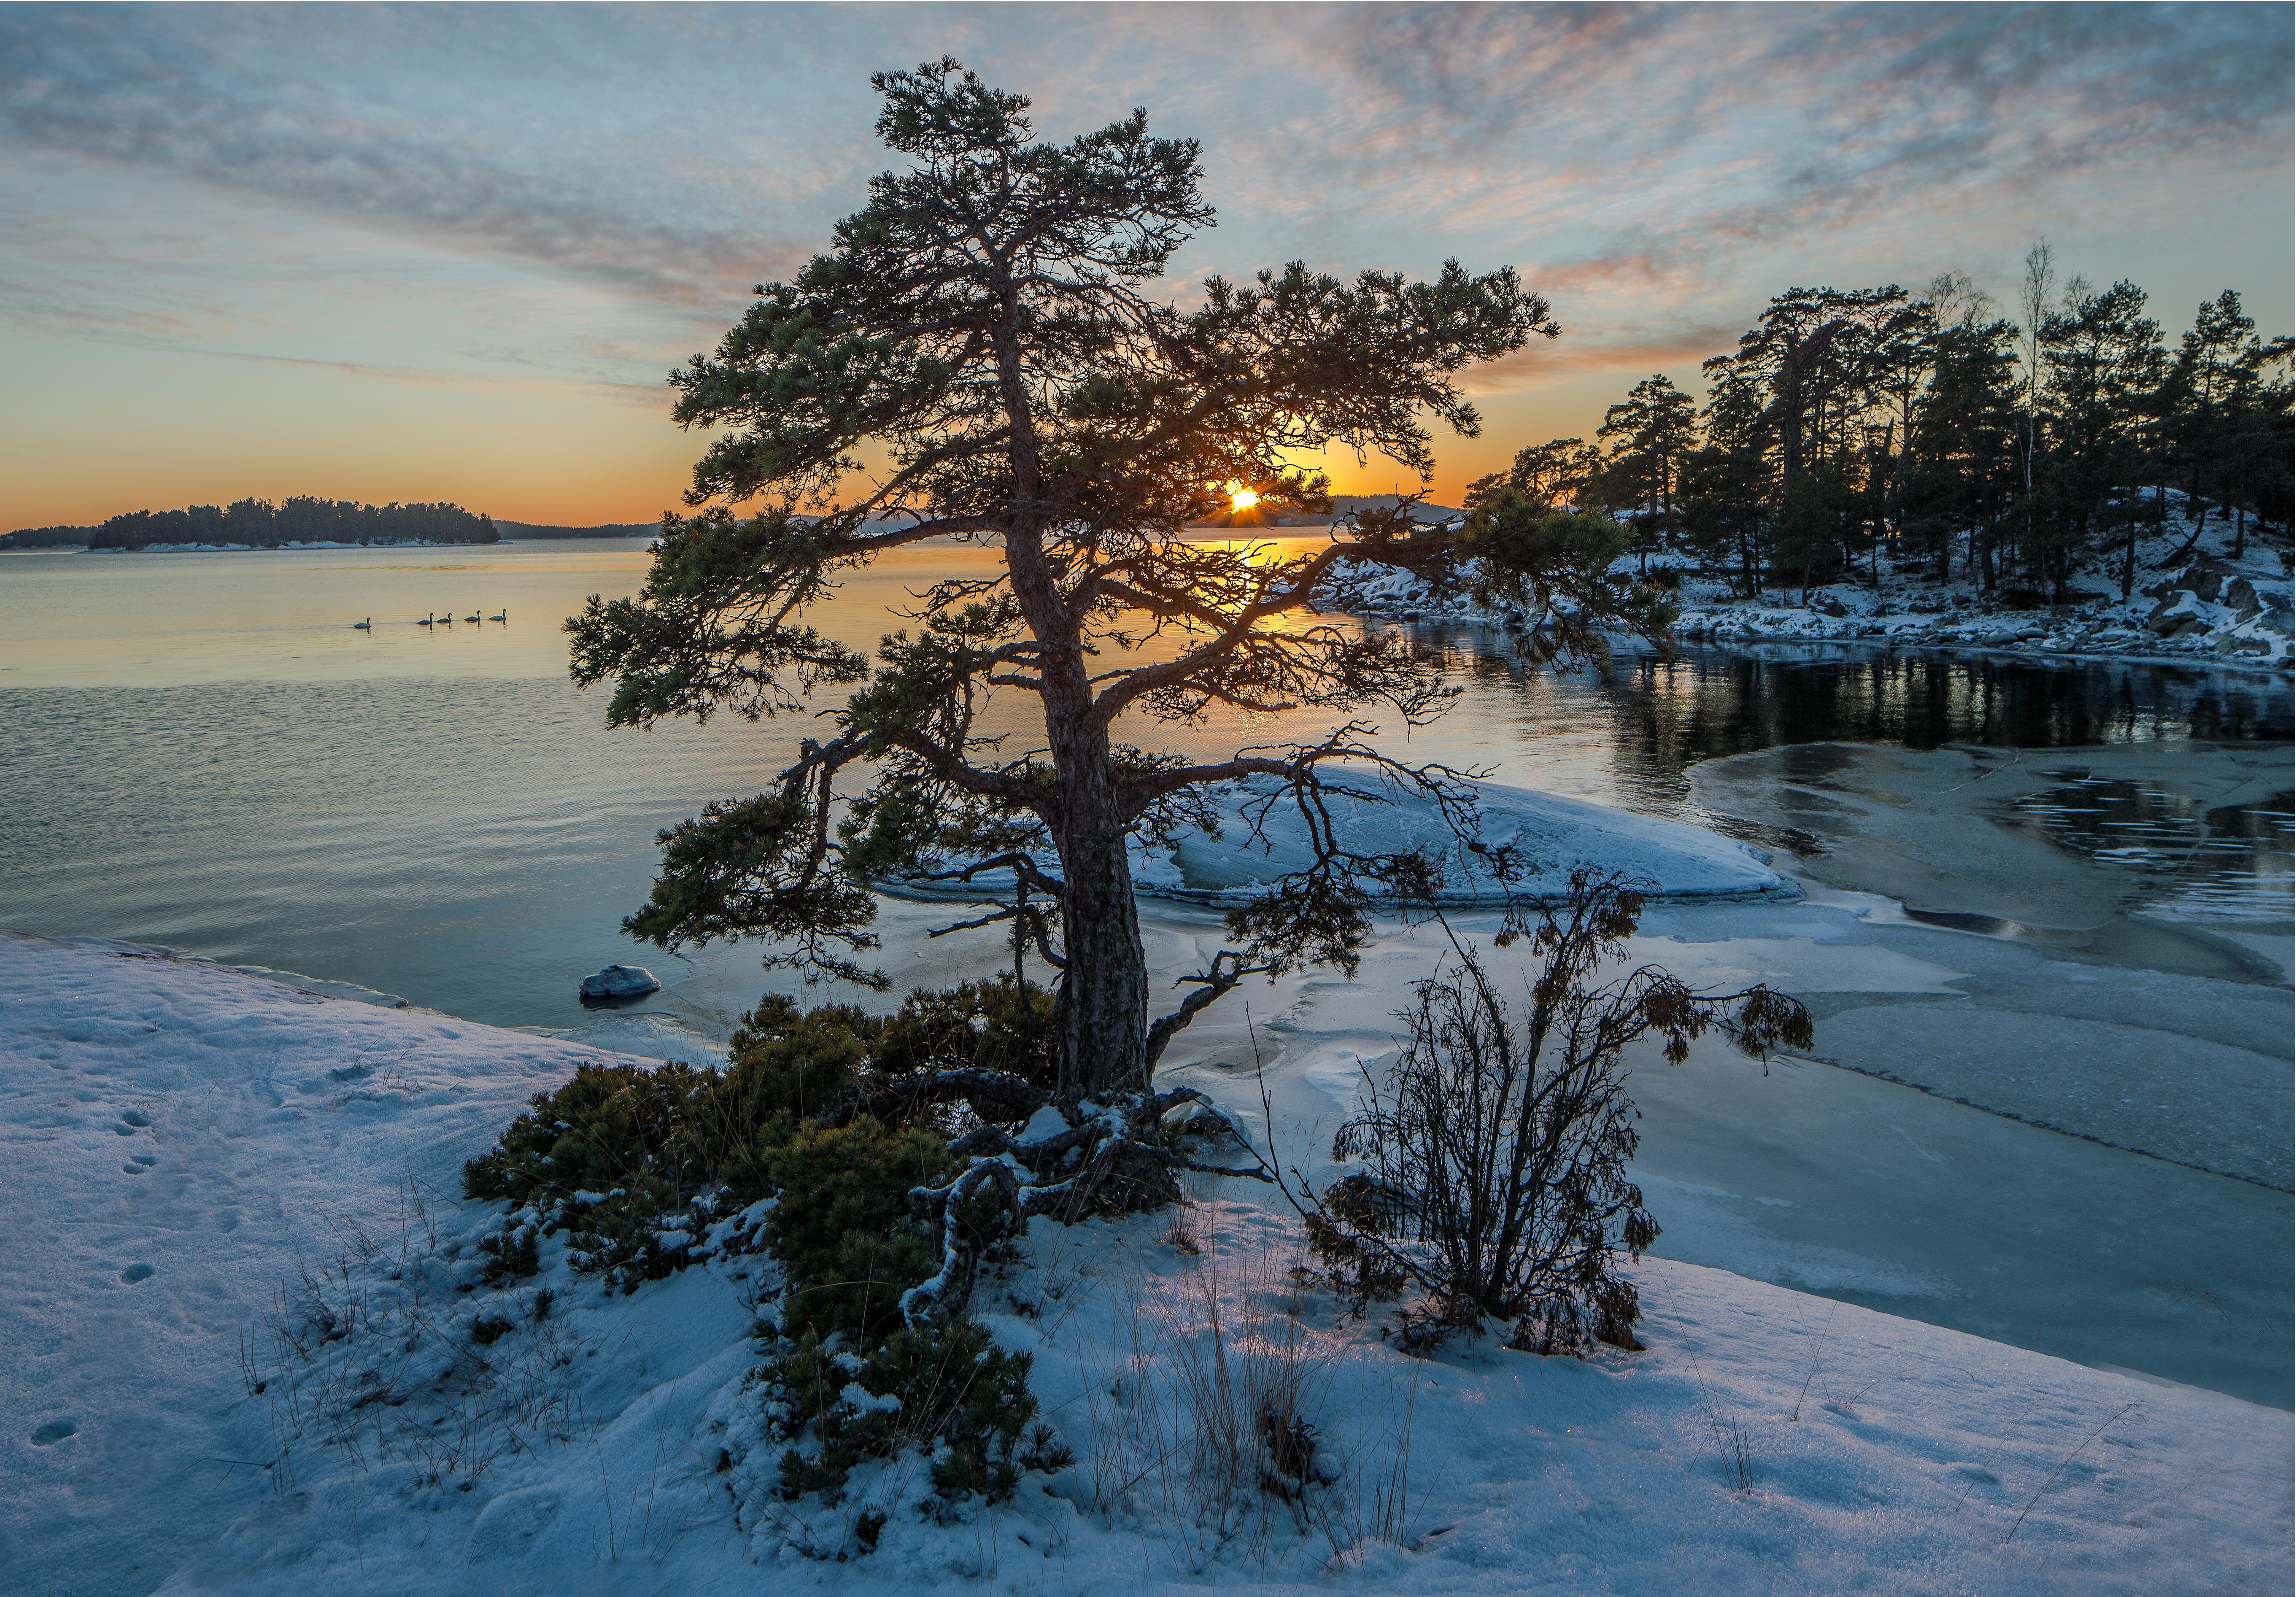 обои морской пейзаж, Швеция, зима, морской лед картинки фото